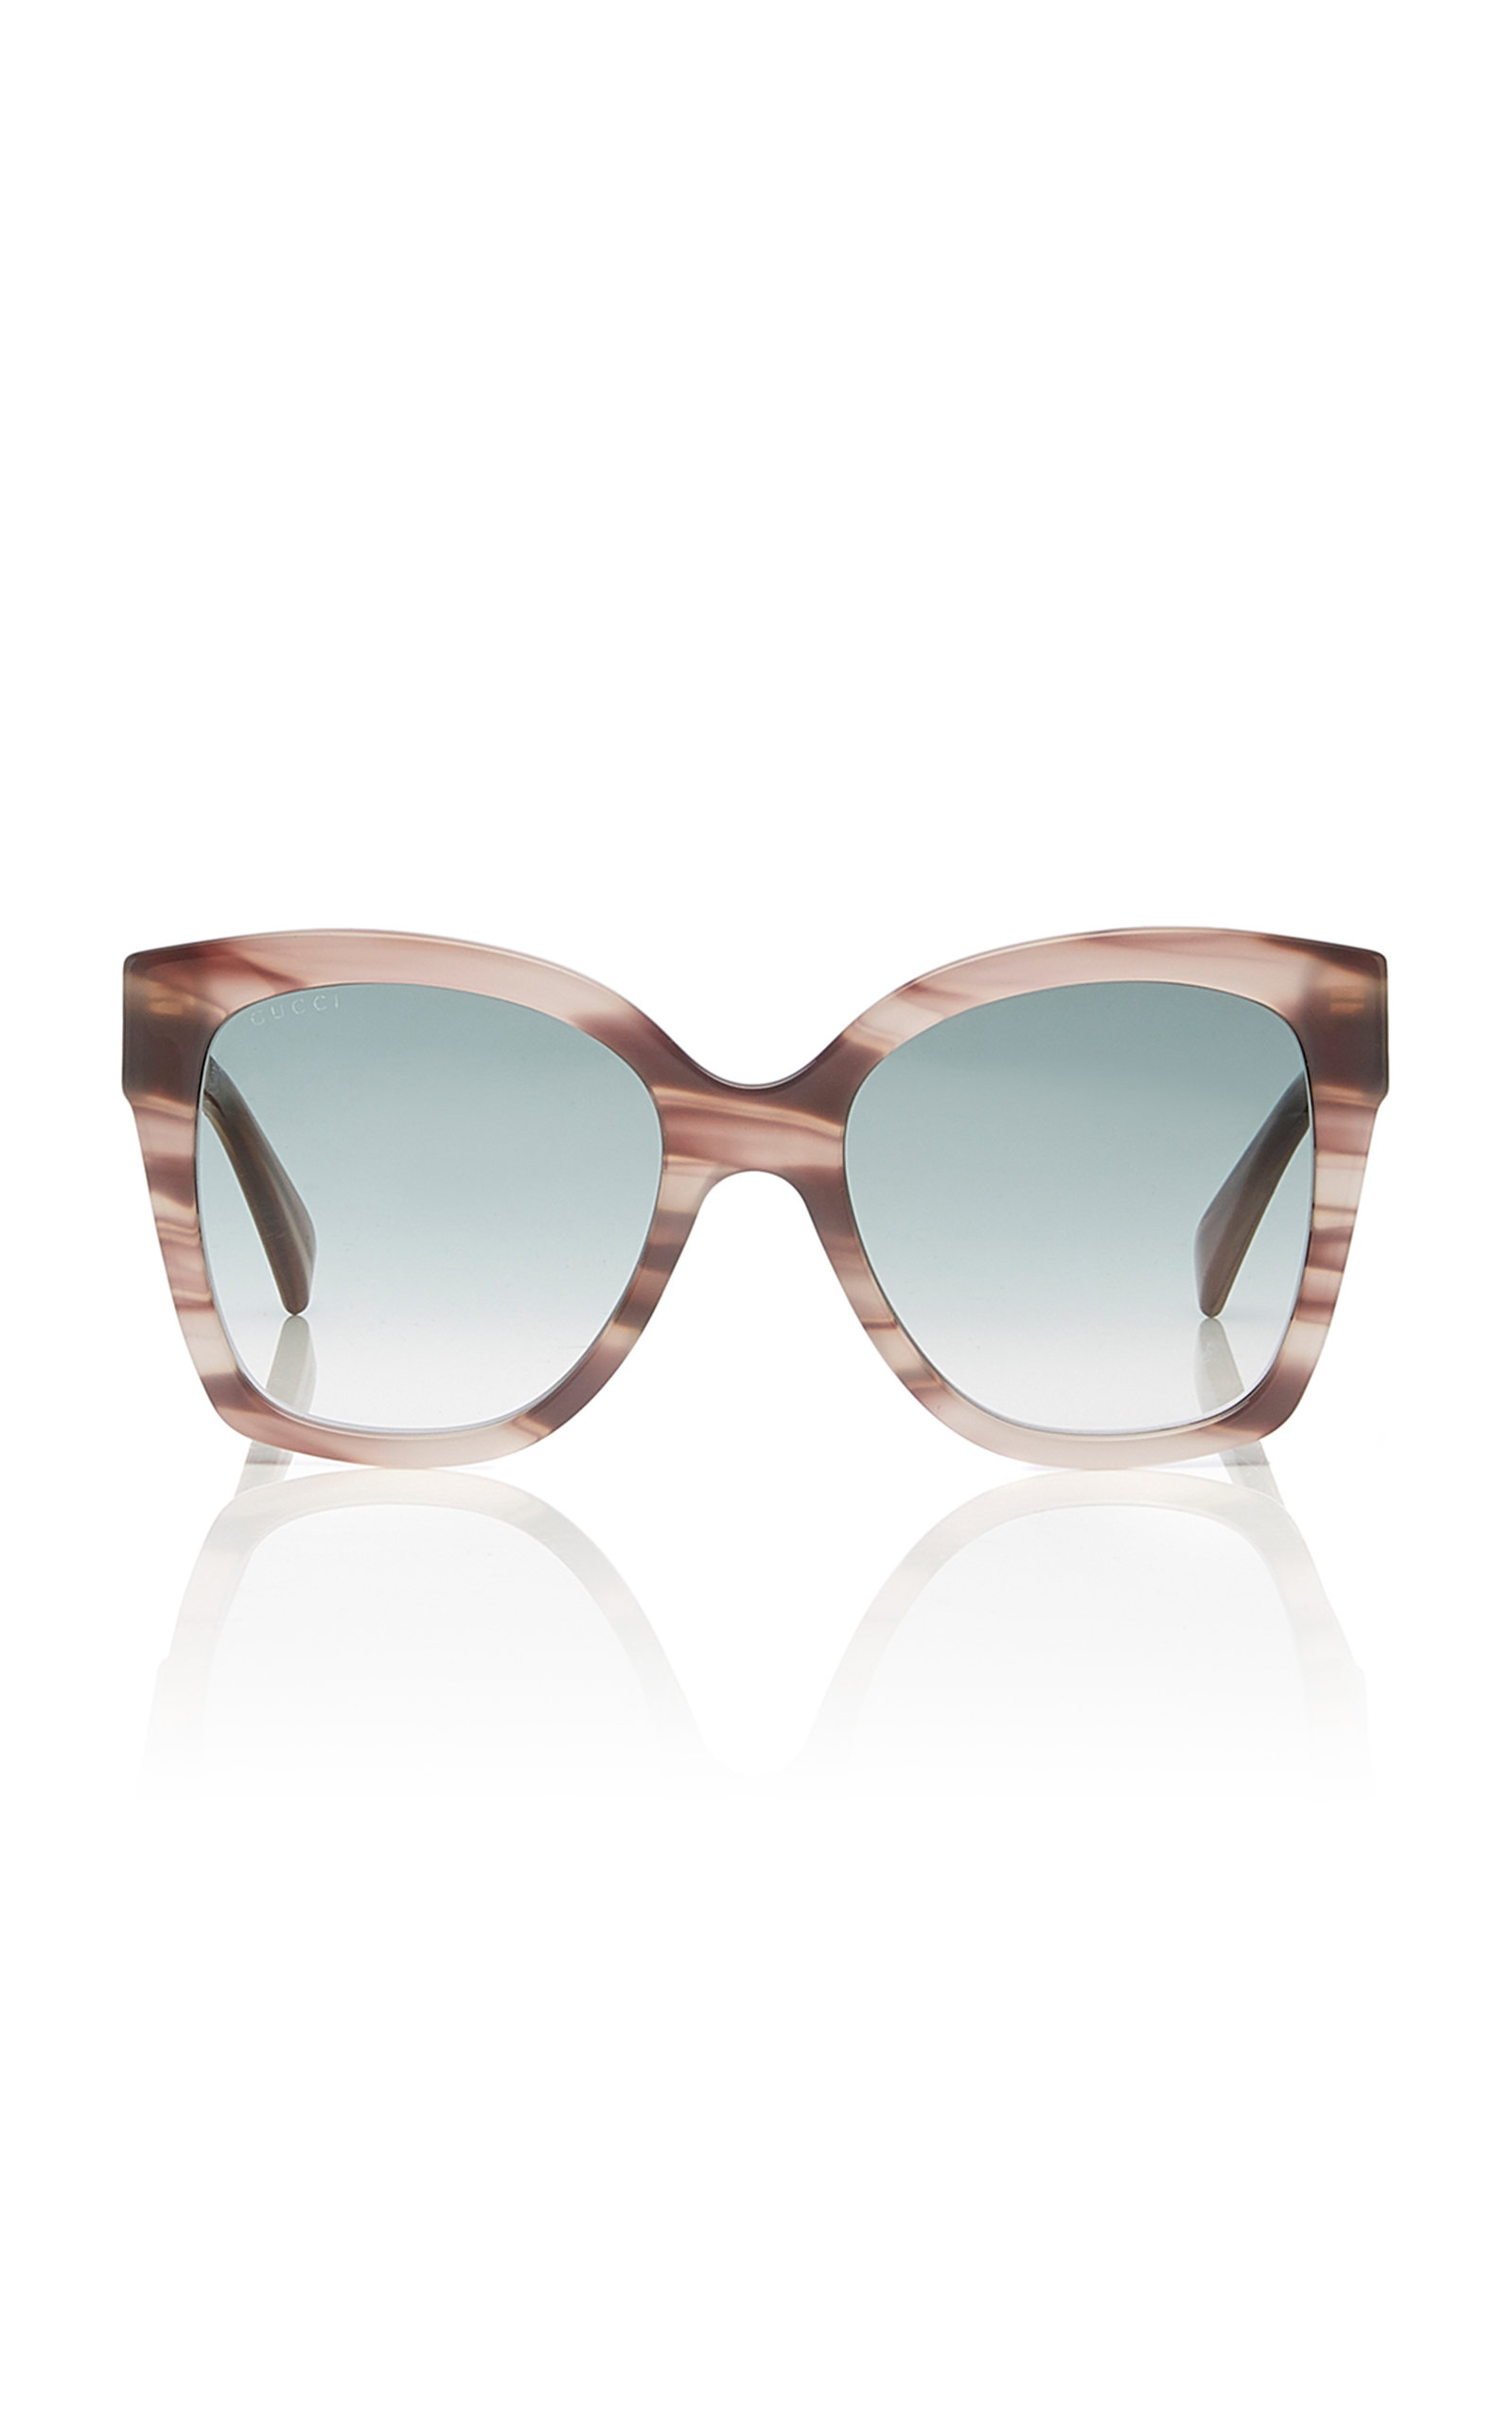 GUCCI | Gucci Sunglasses Marbled Acetate Square-Frame Sunglasses | Goxip